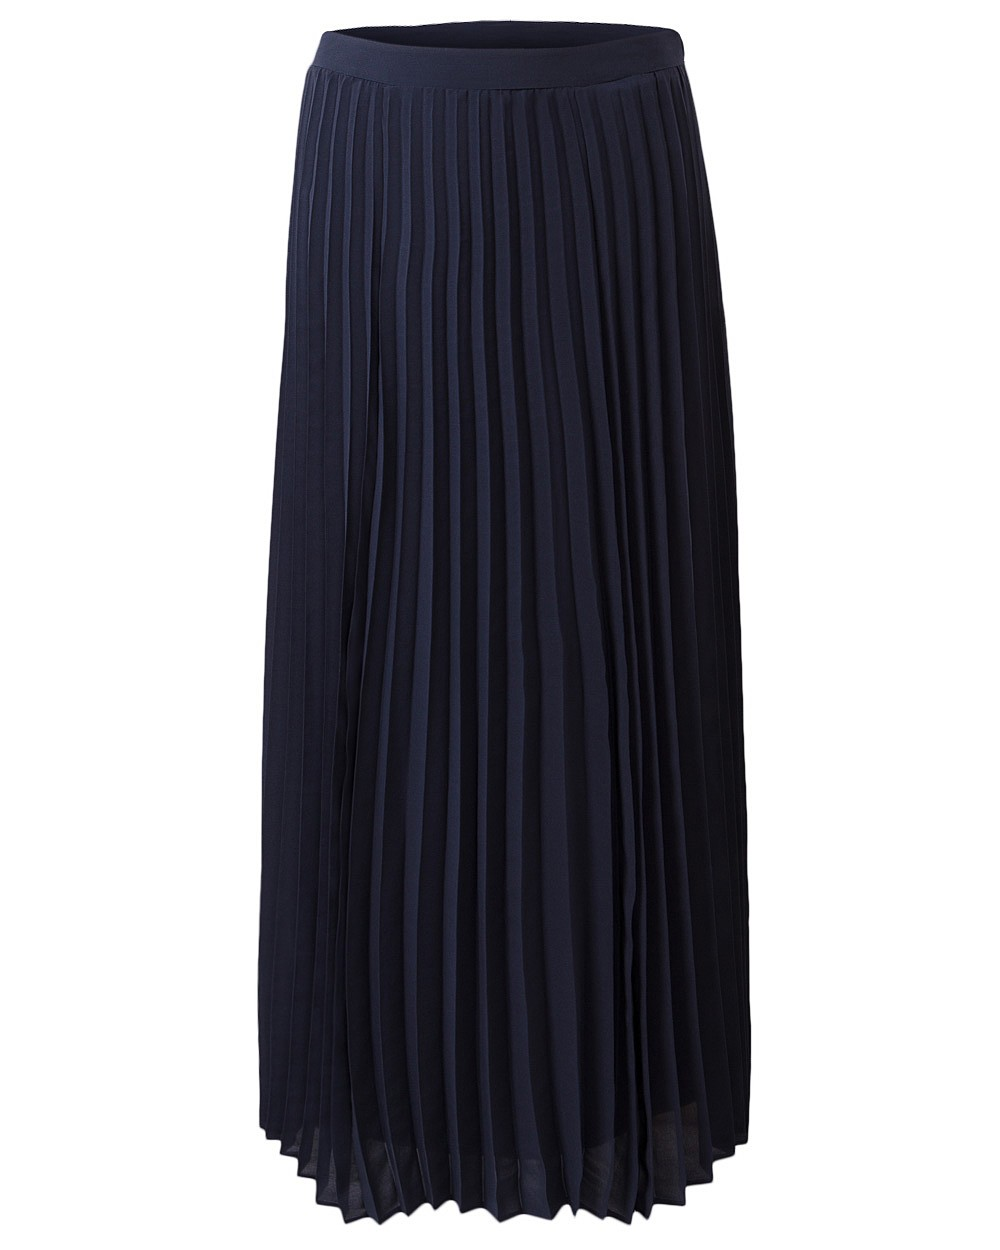 east womens casual sunray pleat maxi skirt calf length